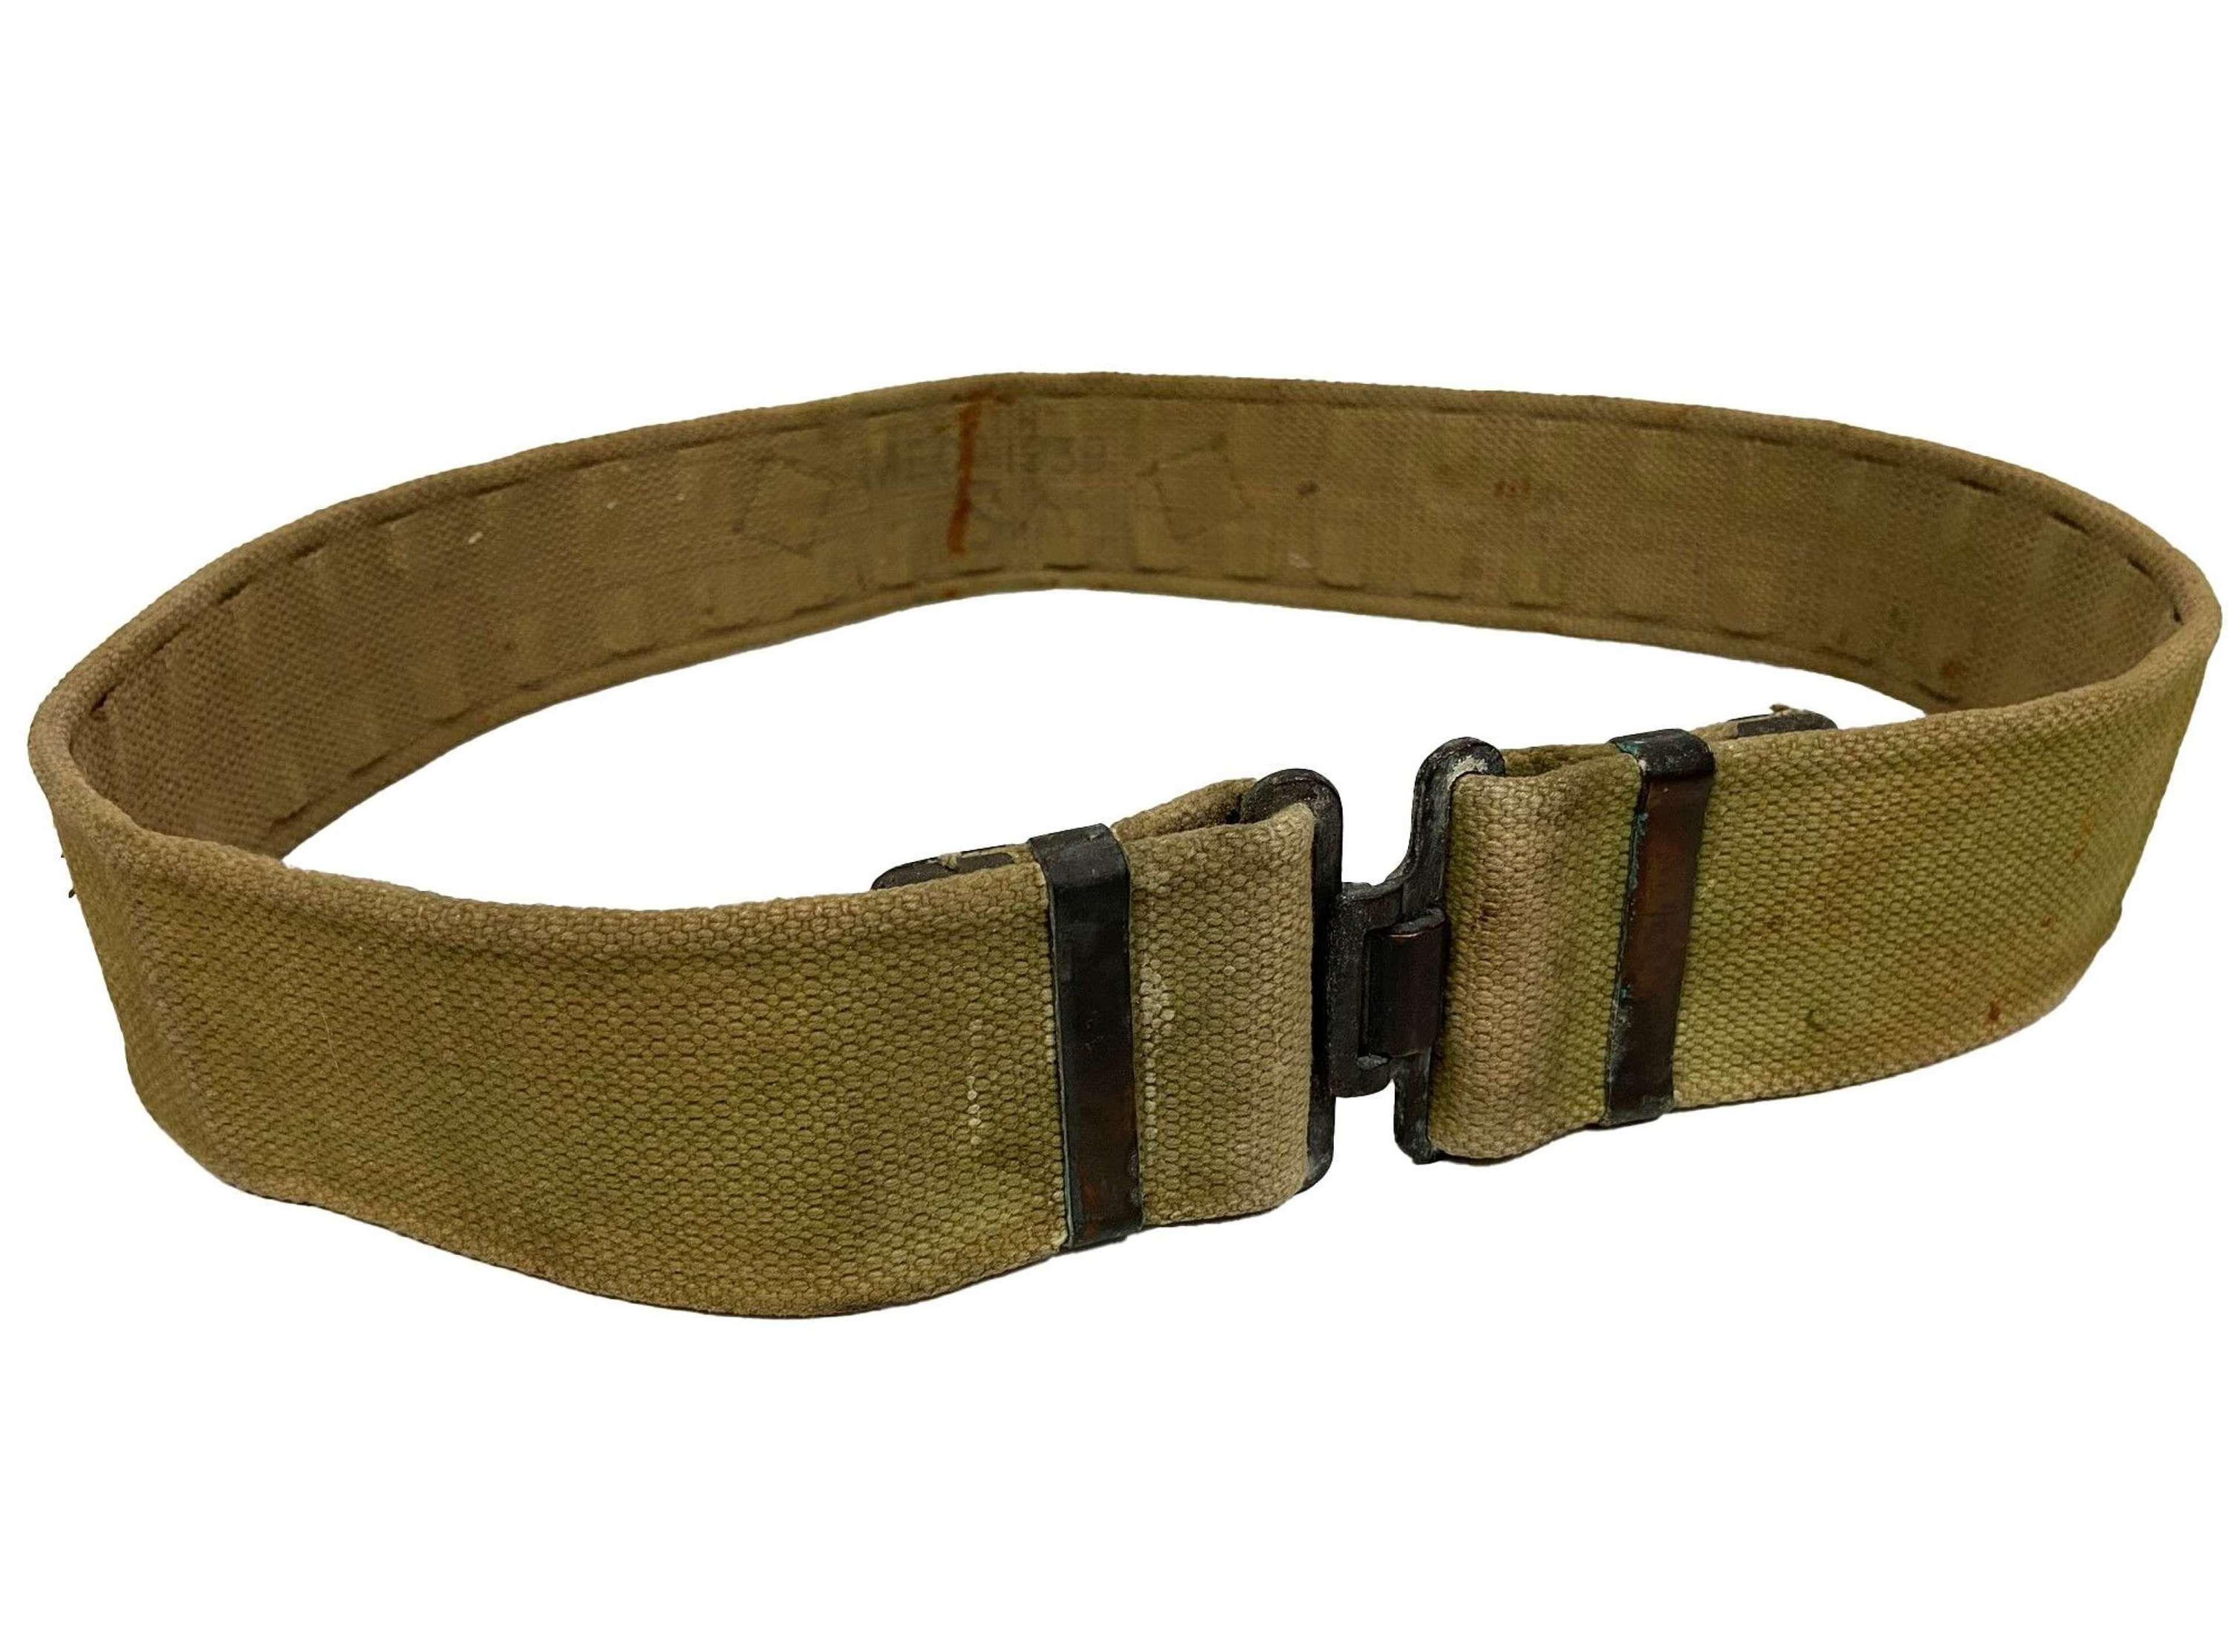 Original 1939 Dated British Army 1937 Pattern Webbing Belt